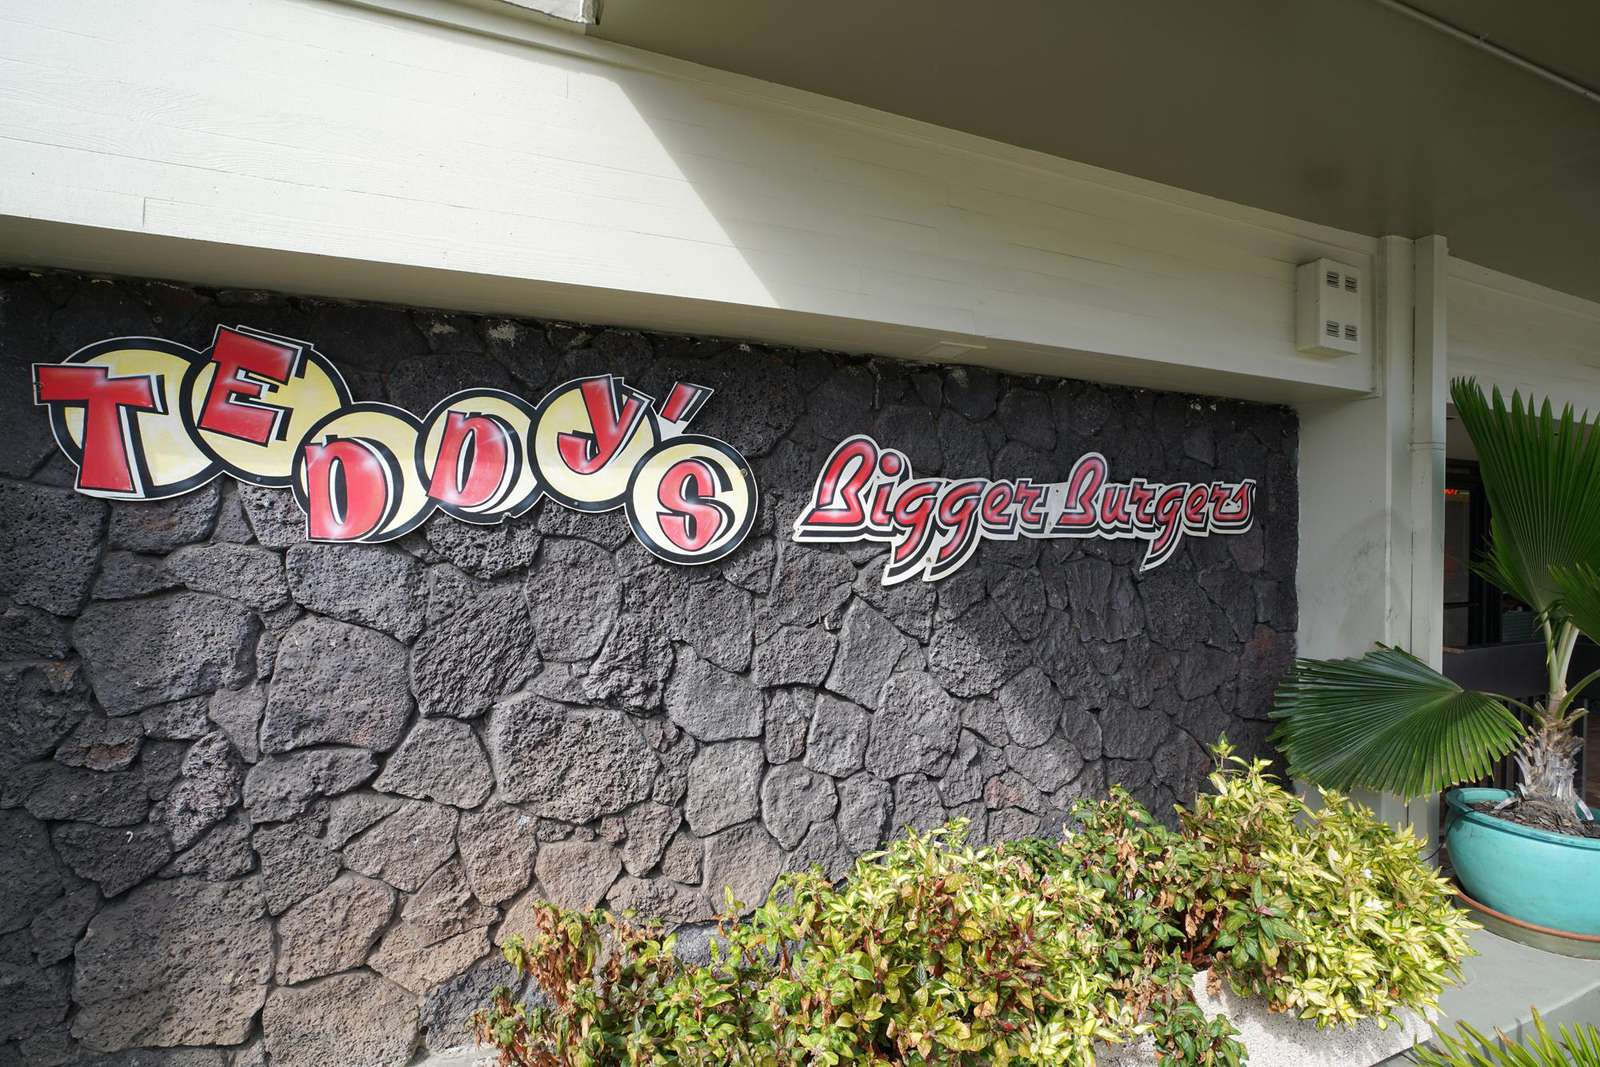 Definitely 'BIGGER' Burgers! :)